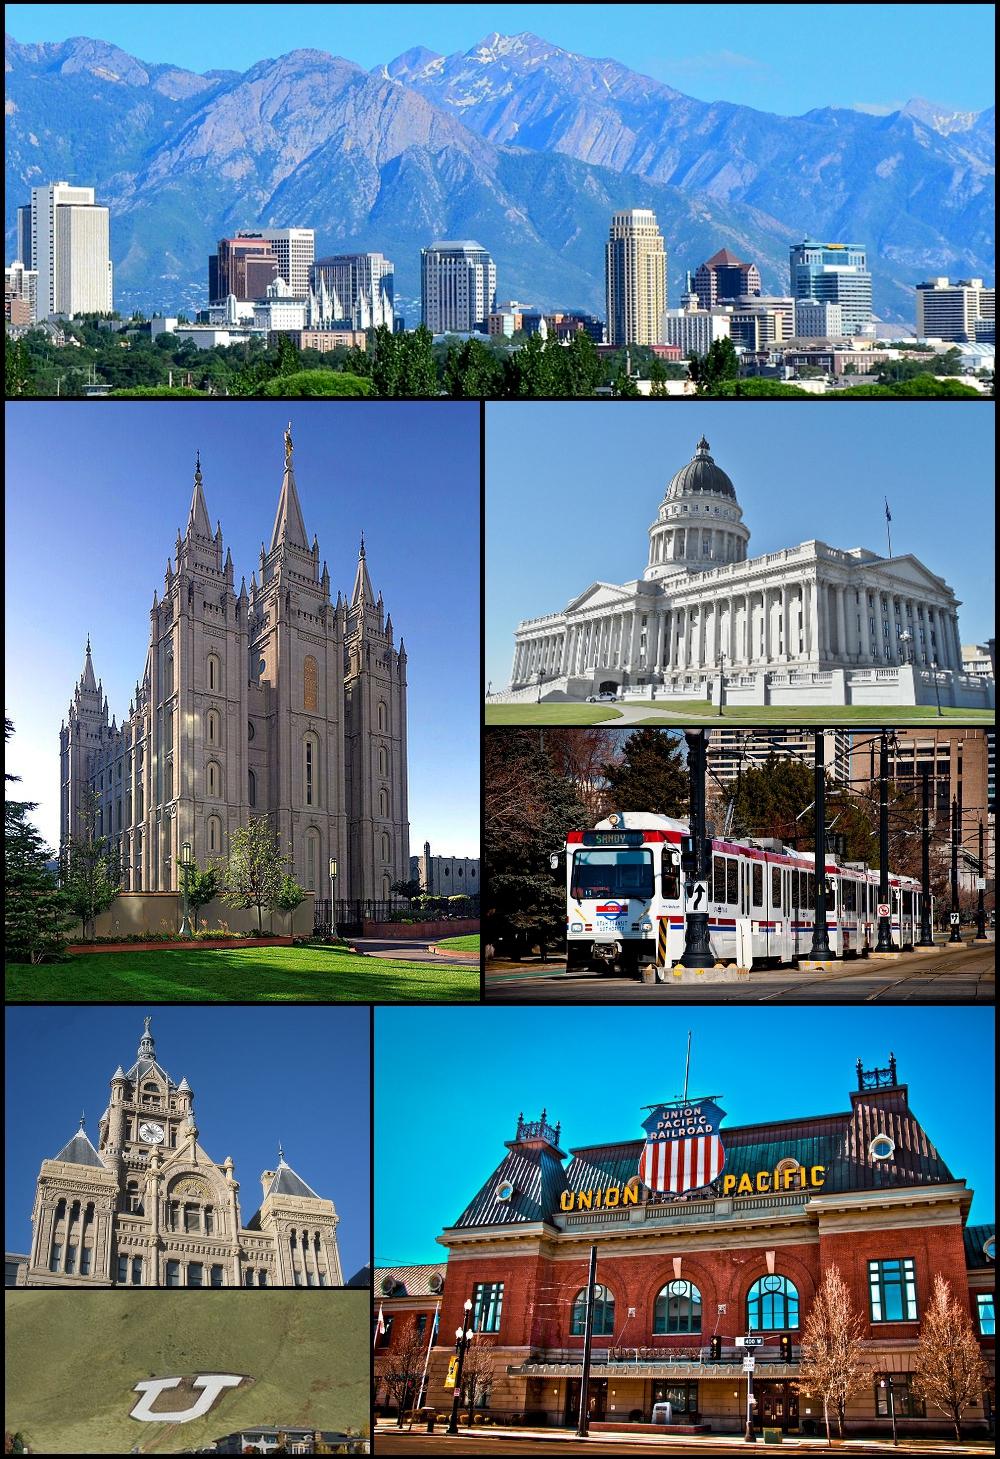 Salt Lake City montage 19 July 2011